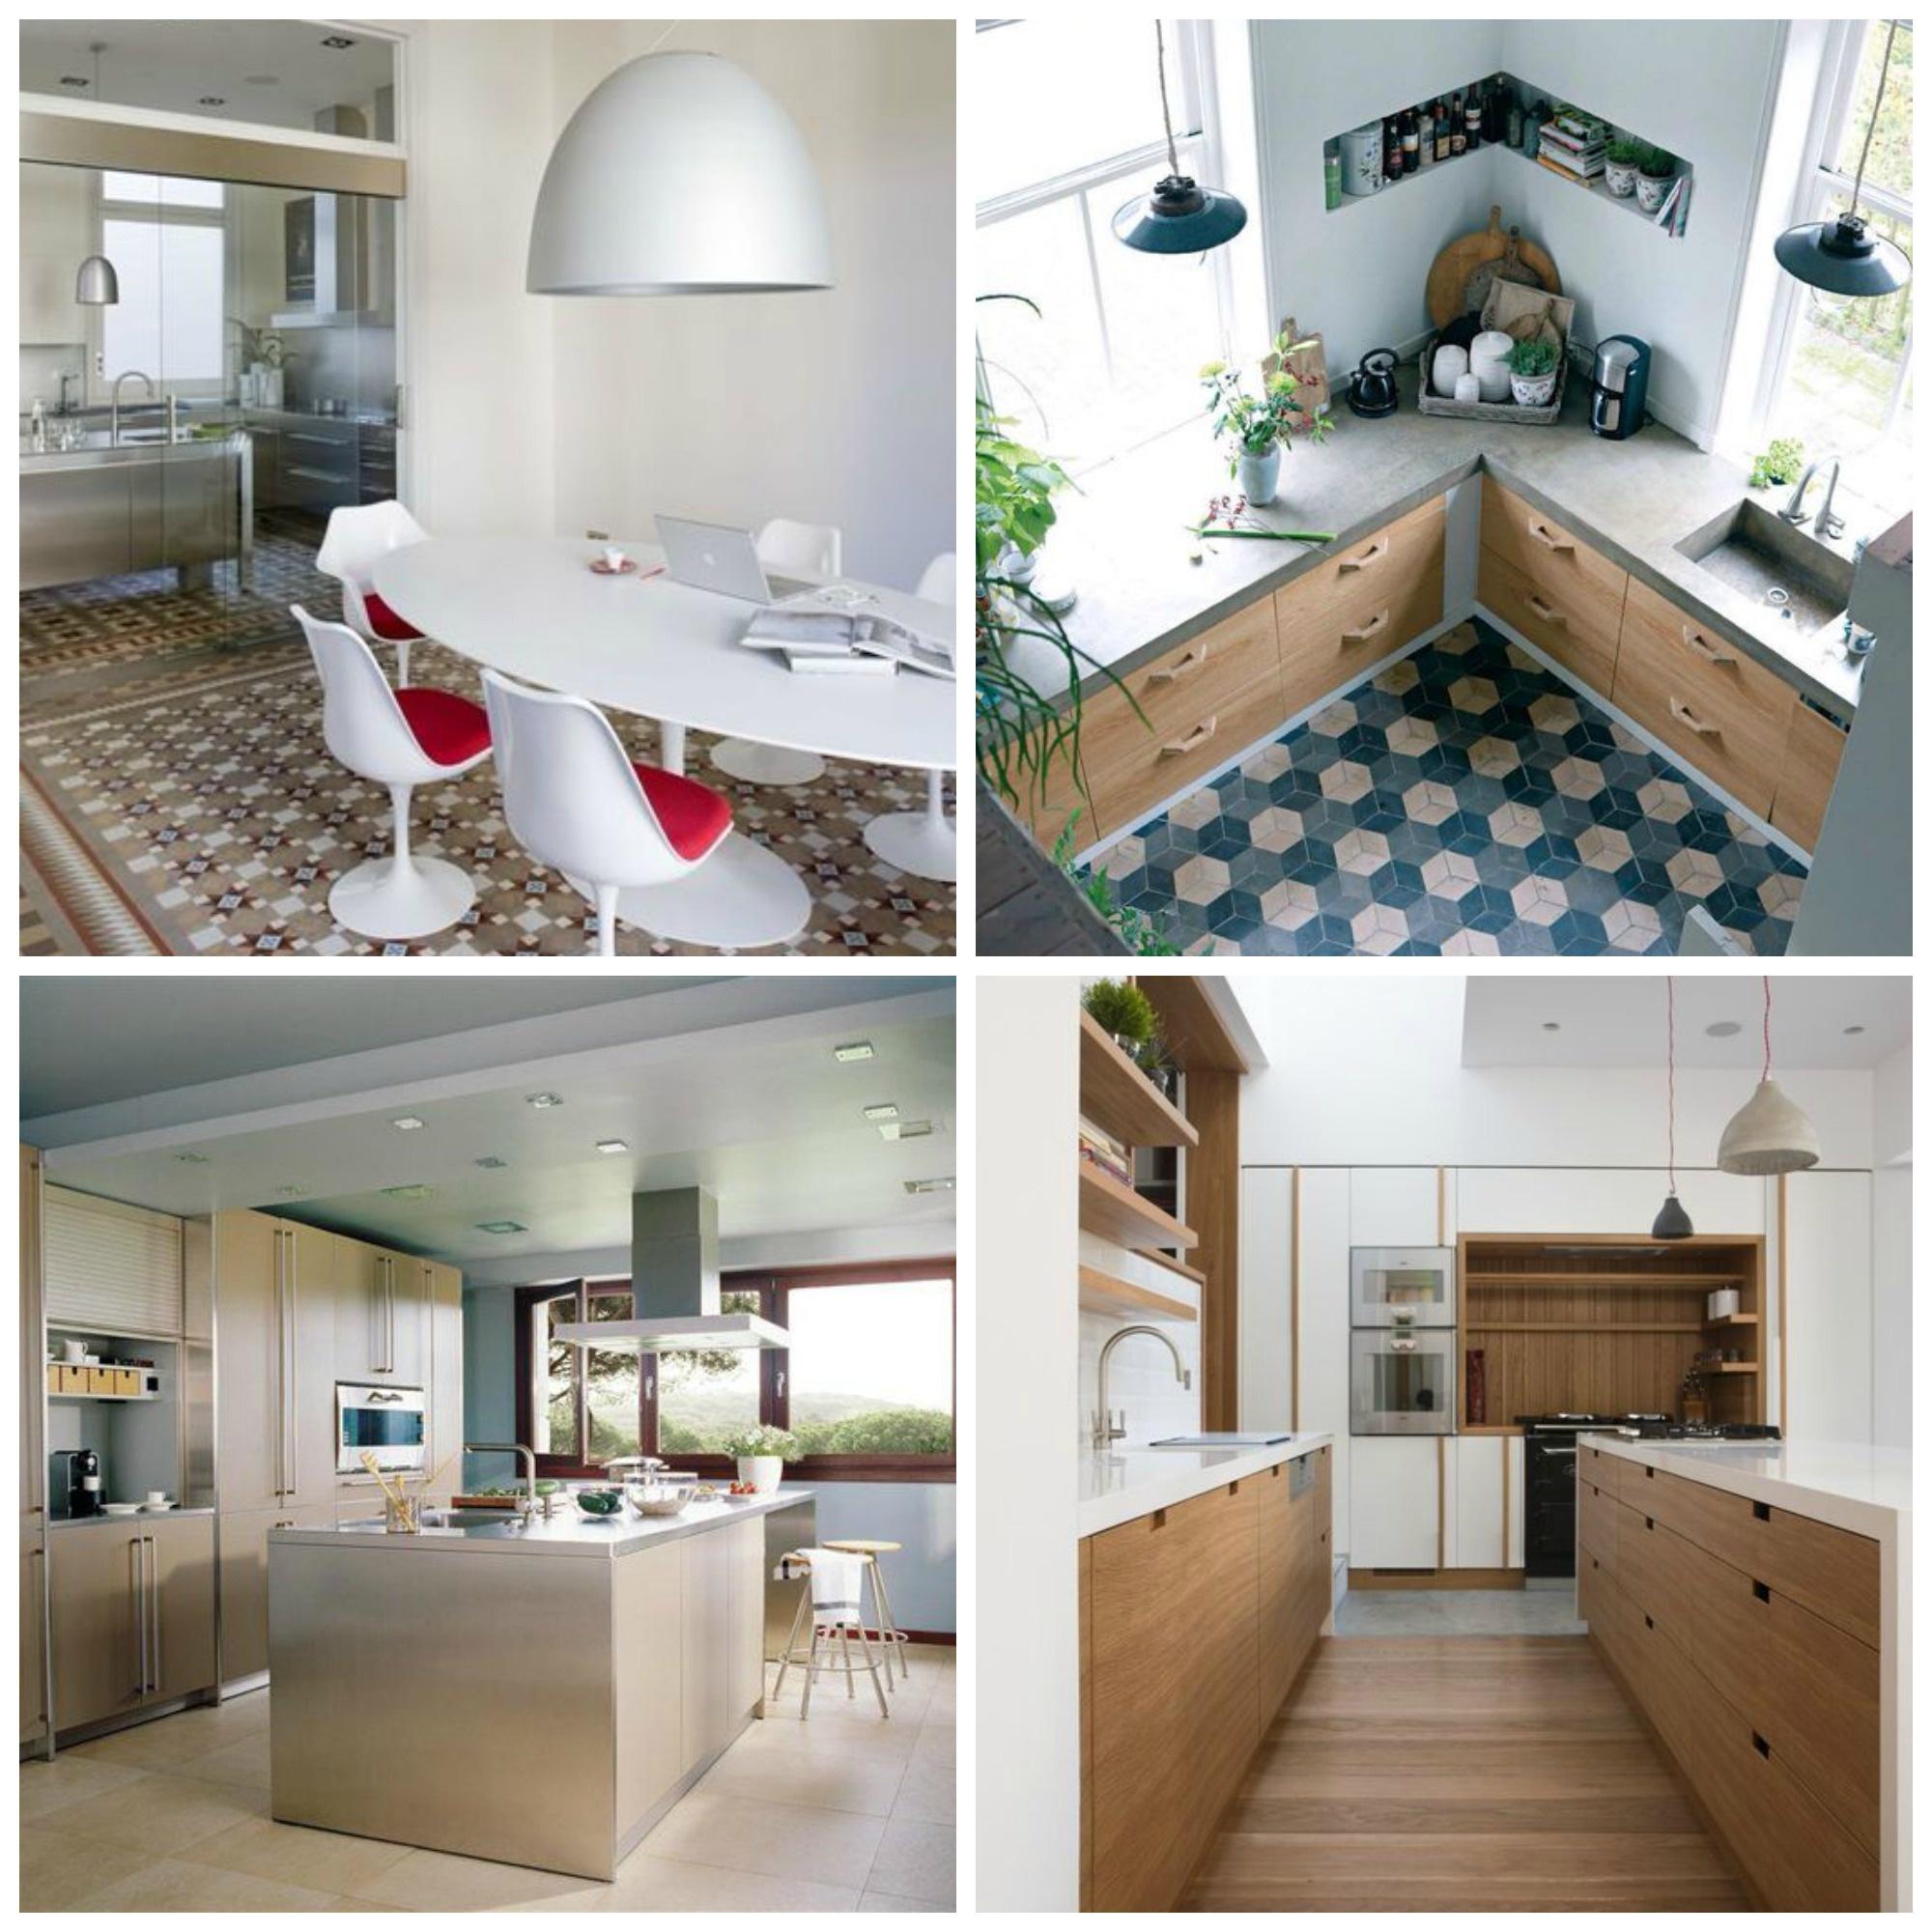 Pintar Suelo Cocina - Diseños Arquitectónicos - Mimasku.com